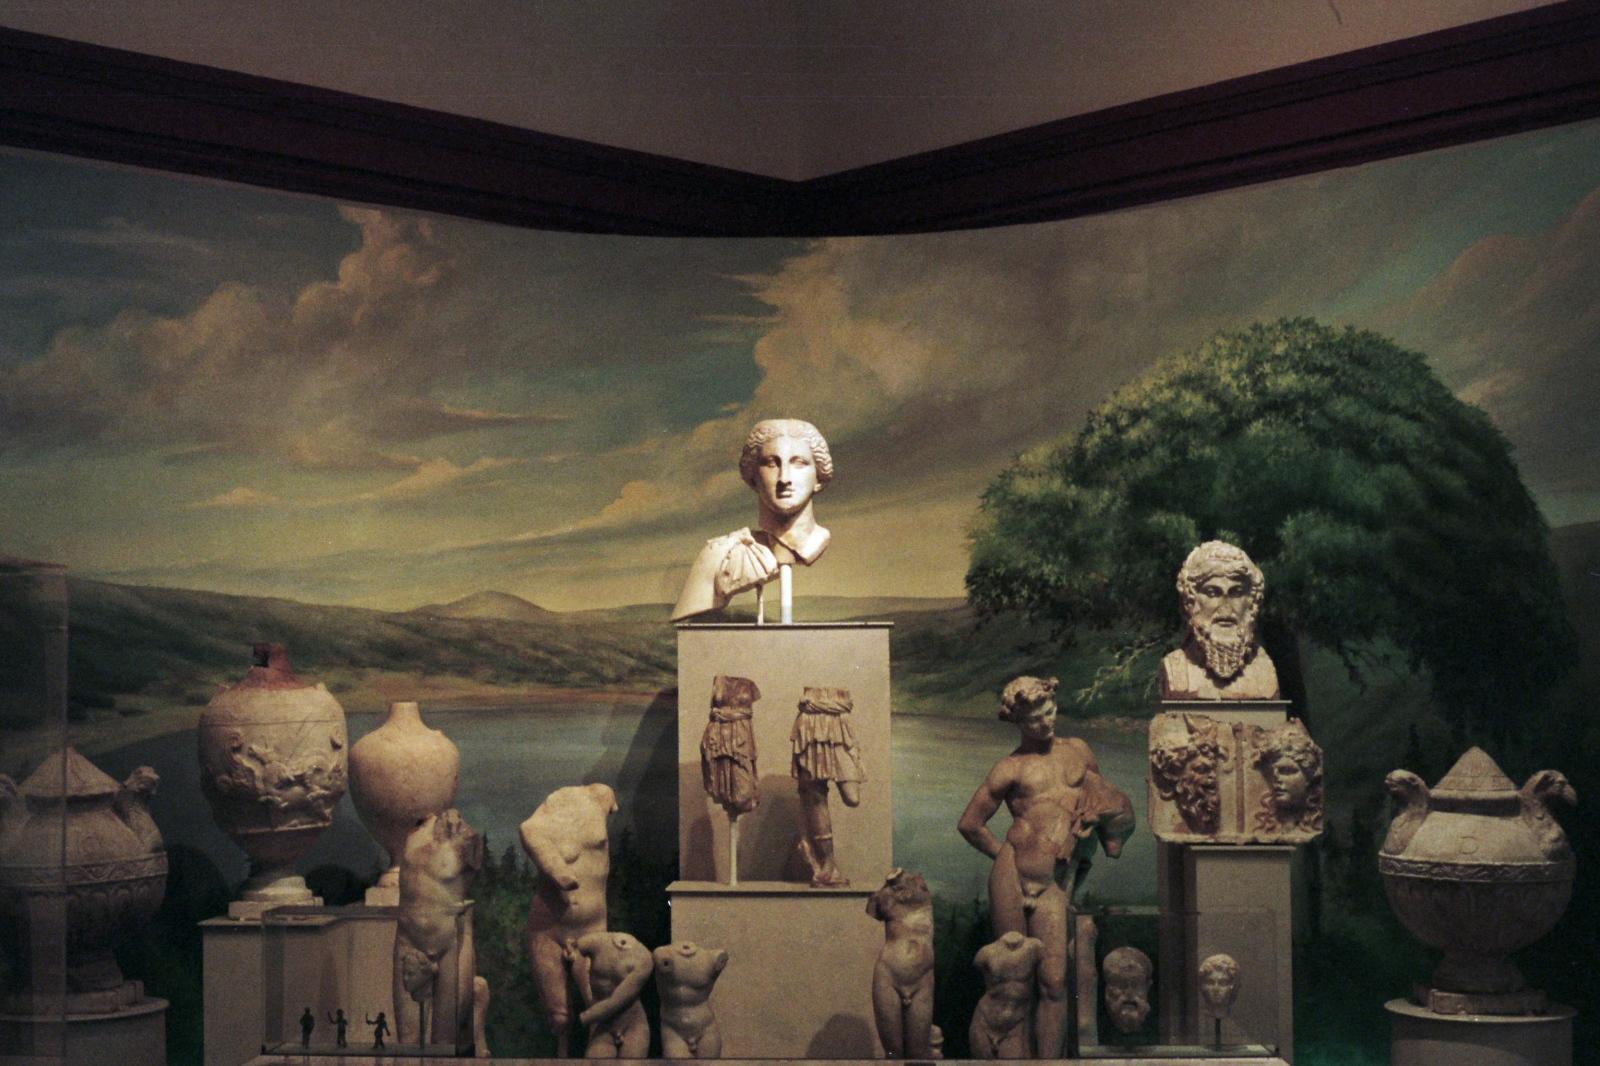 Roman antiquities display, Philadephia, PA